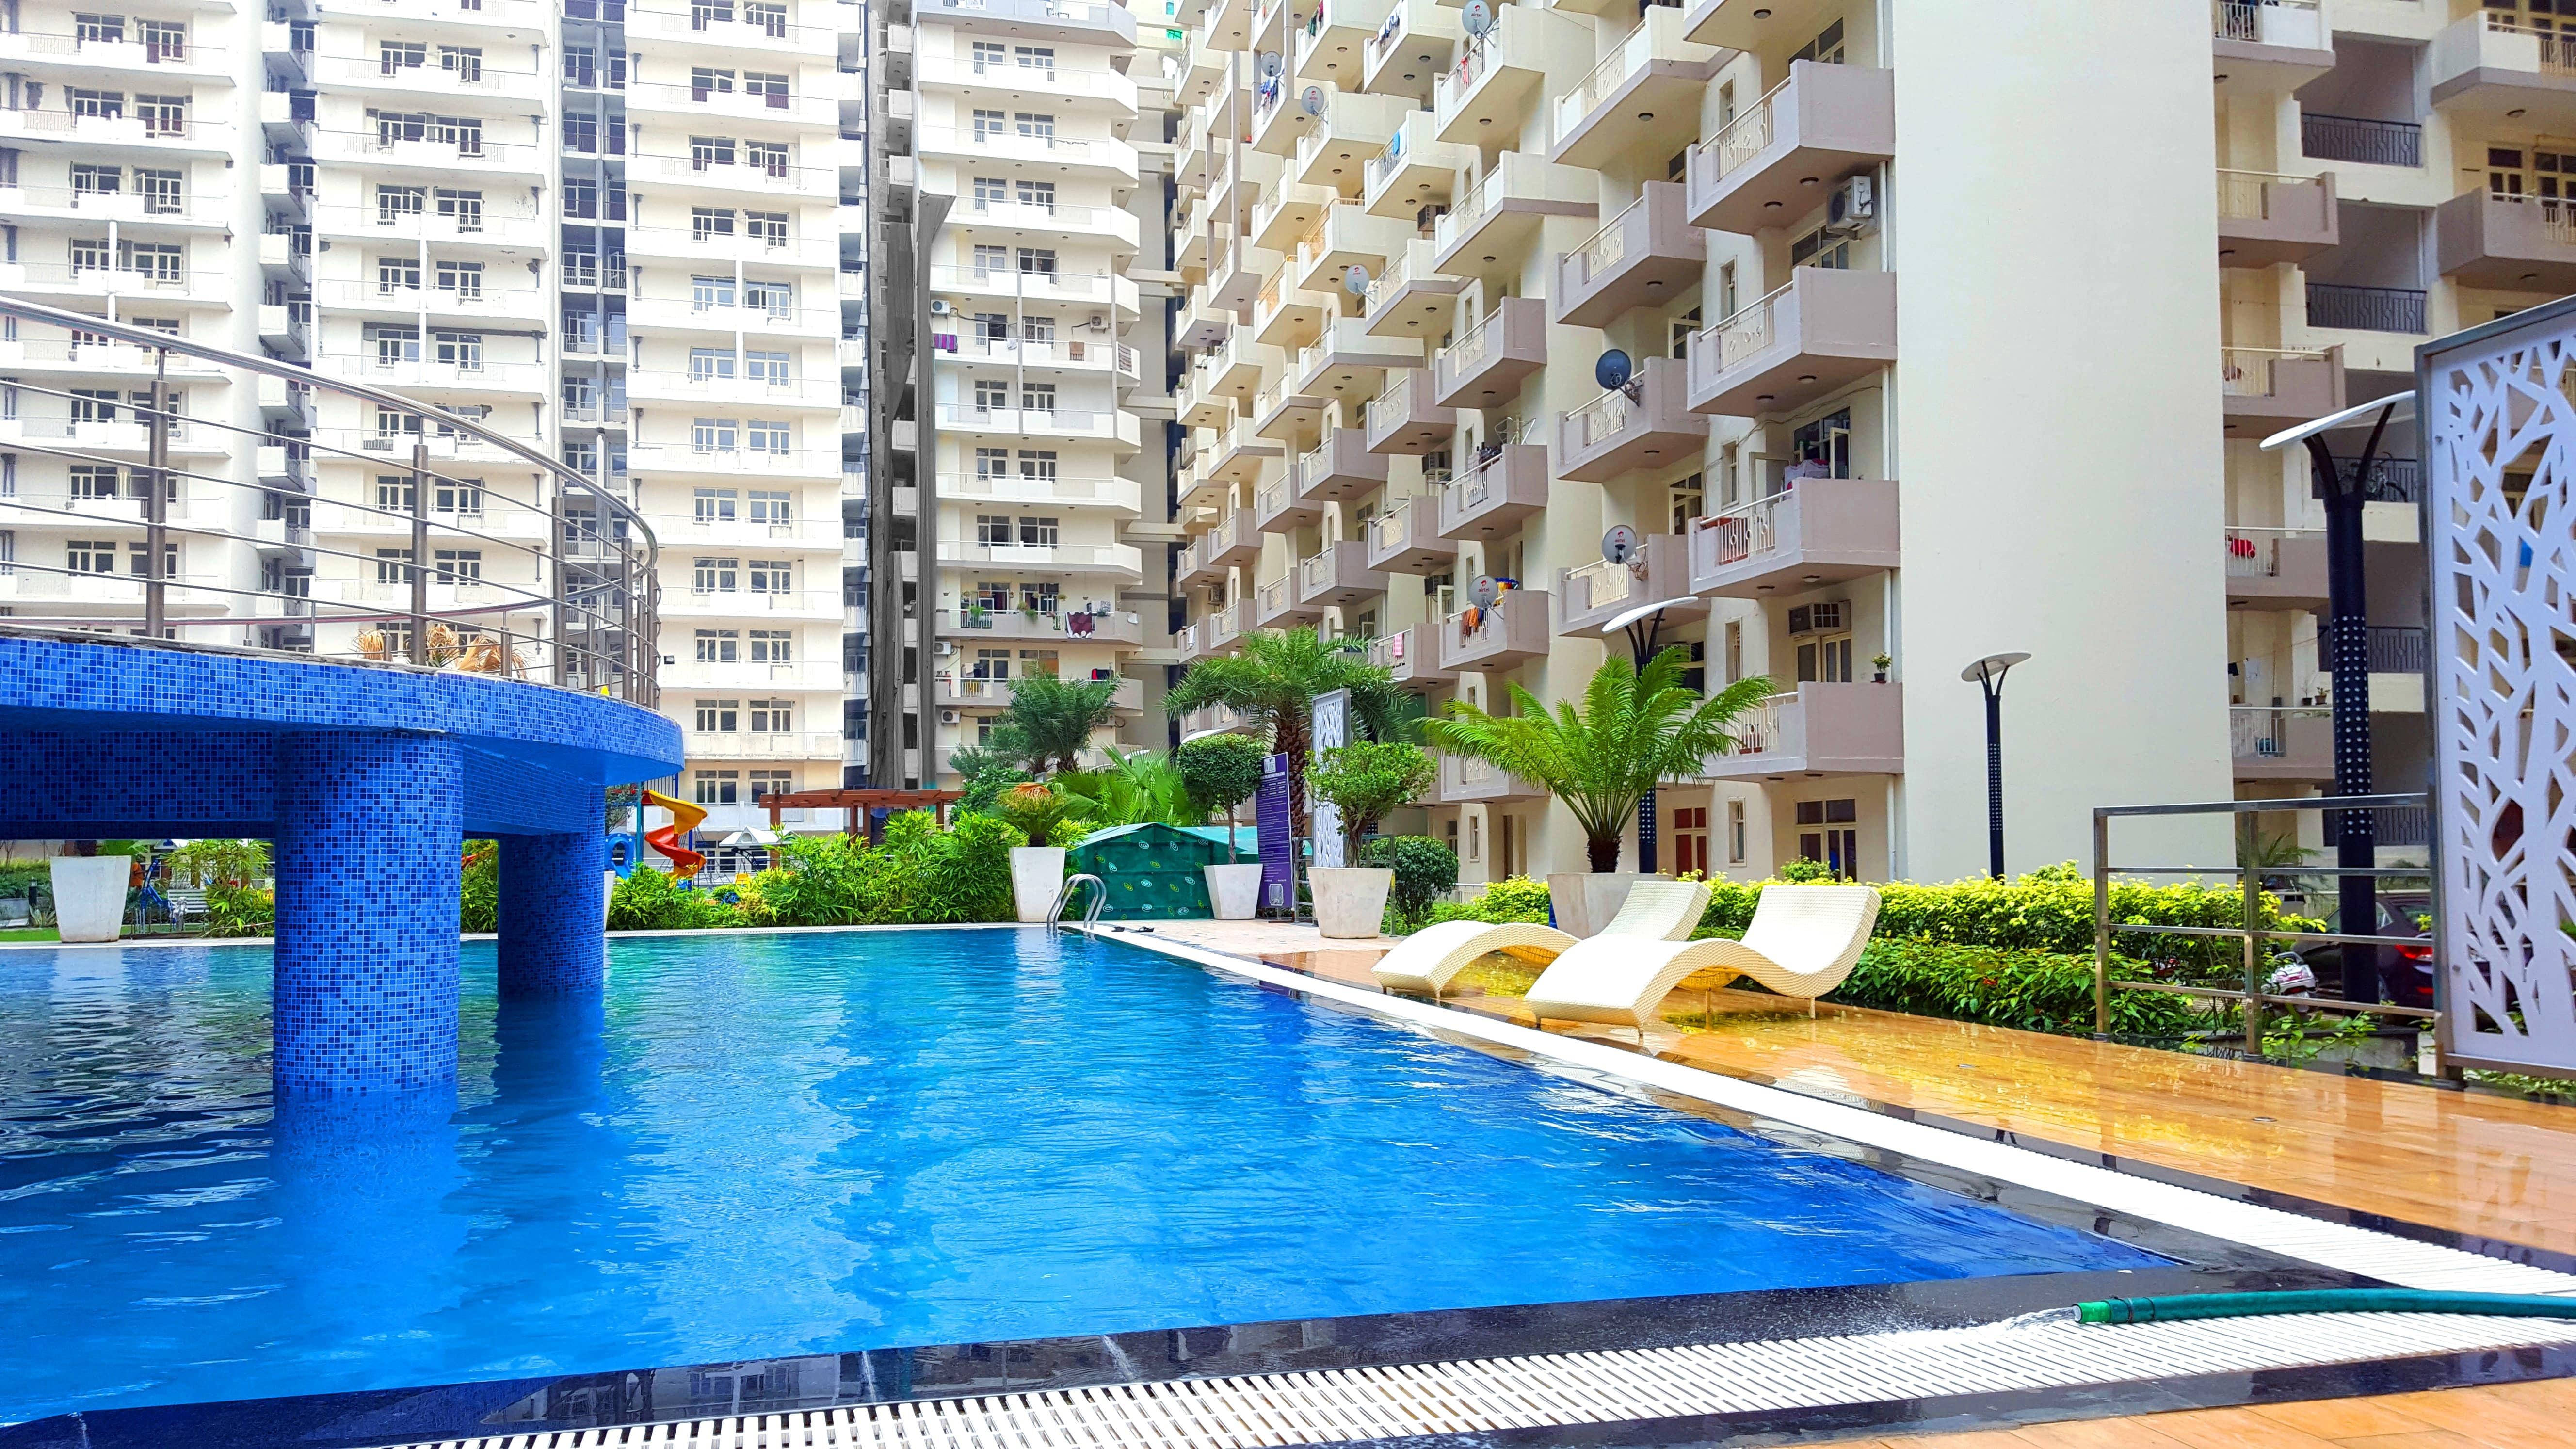 06101908295916__swimming_pool__2_eCHZv.jpg